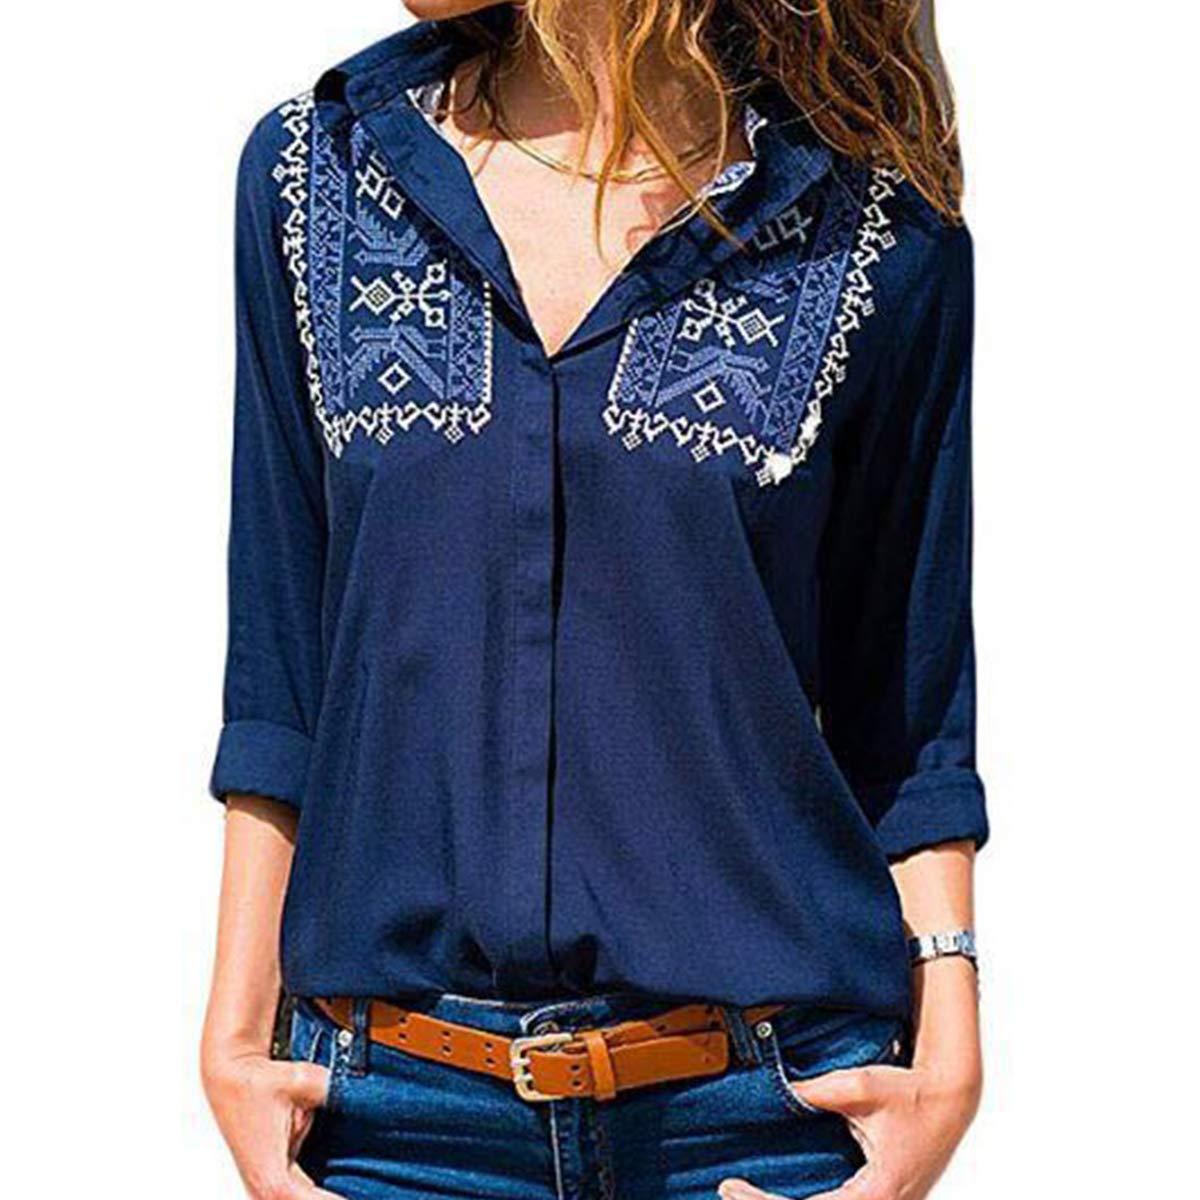 bluee Flextiicinax Floral Print Lapel Shirt Button Down Long Sleeve Elegant Women's Blouse